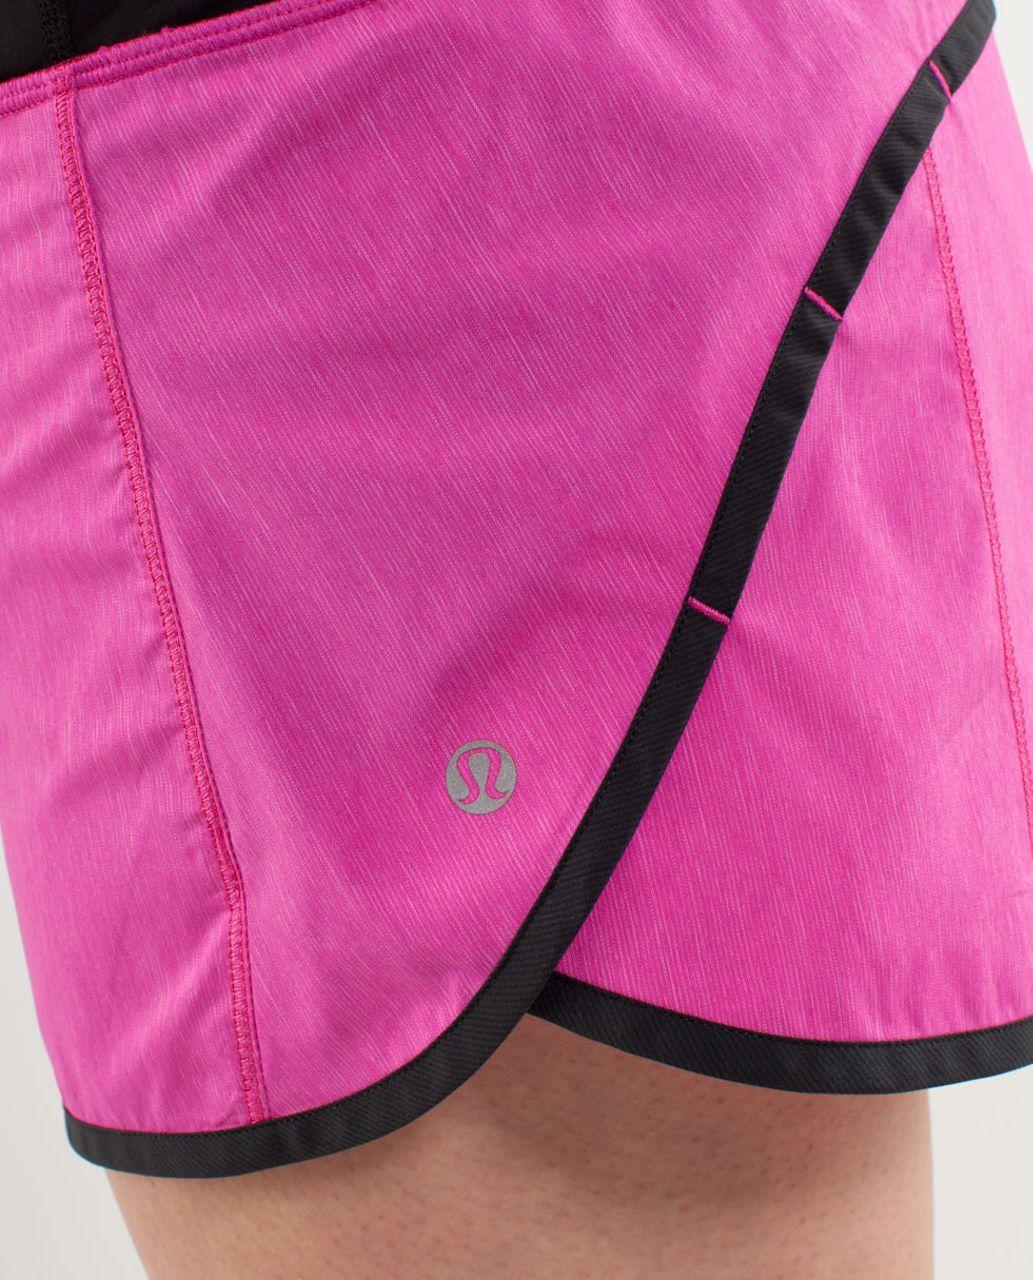 Lululemon Turbo Run Short - Paris Pink /  Black